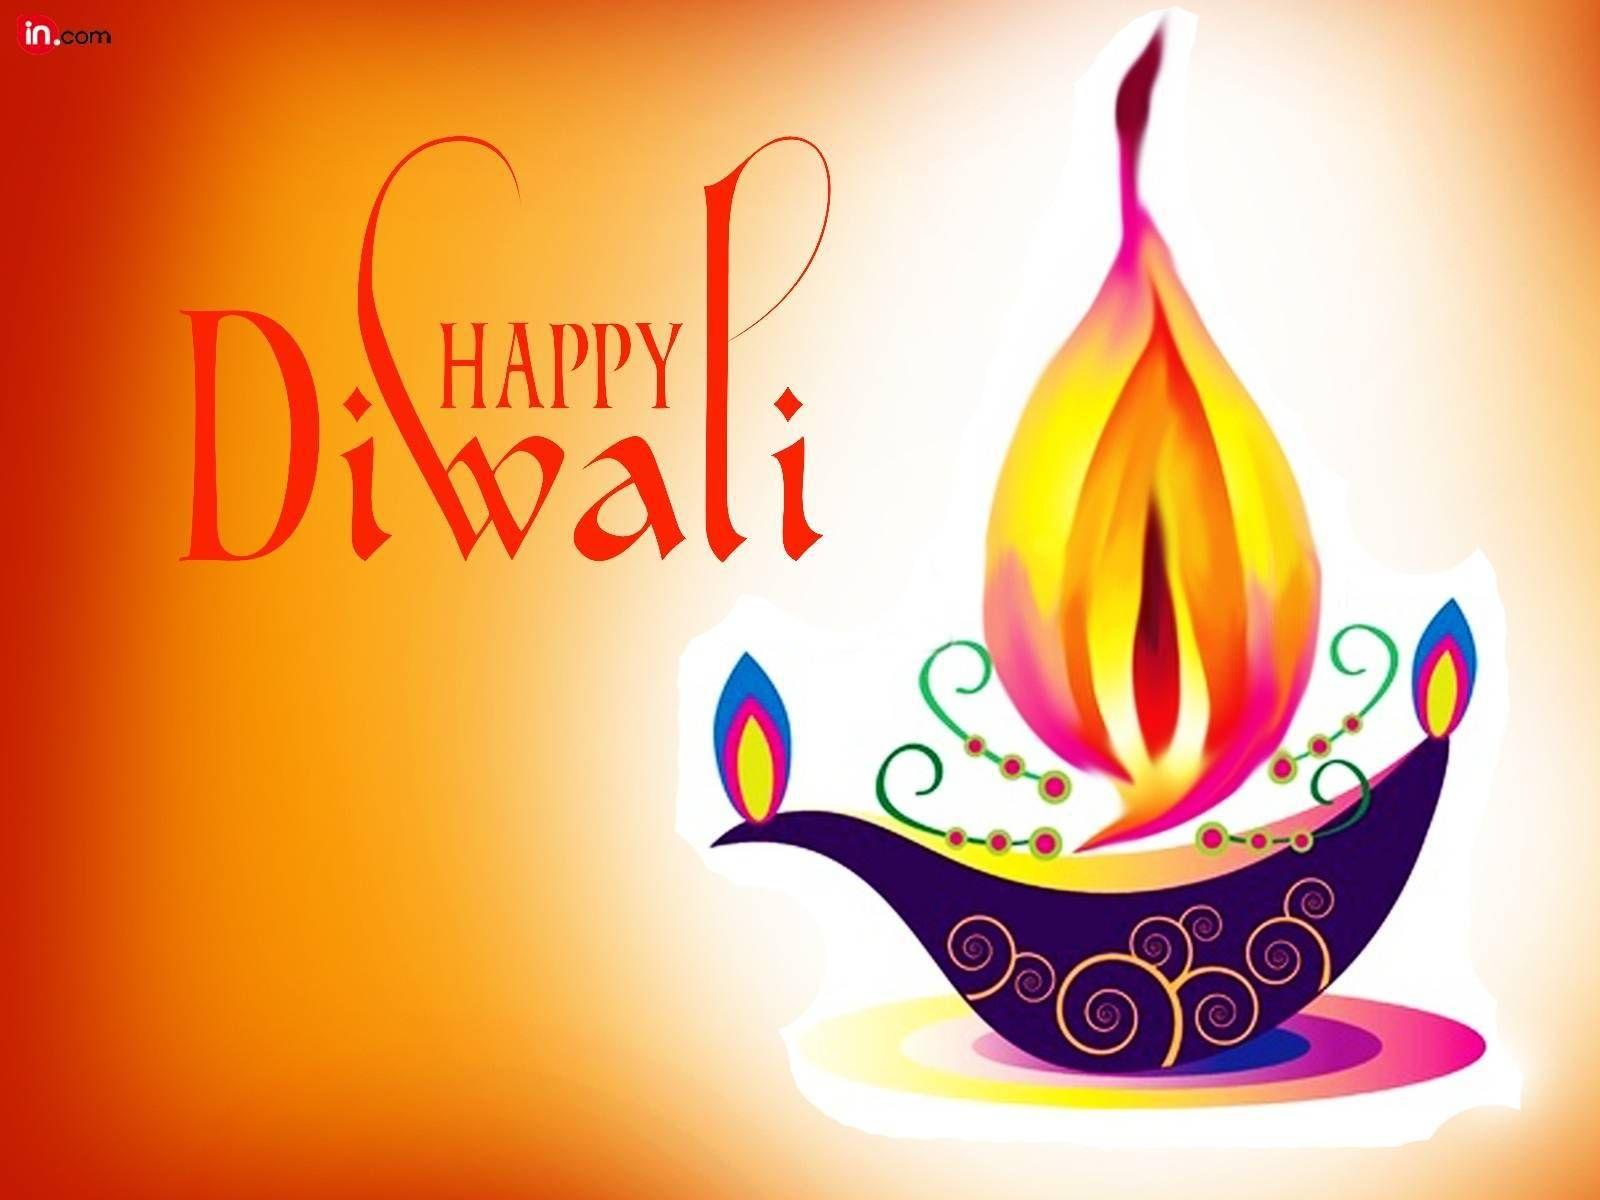 Diwali Wallpaper 1024x768 Fibe Diwali 2016 Pinterest Happy